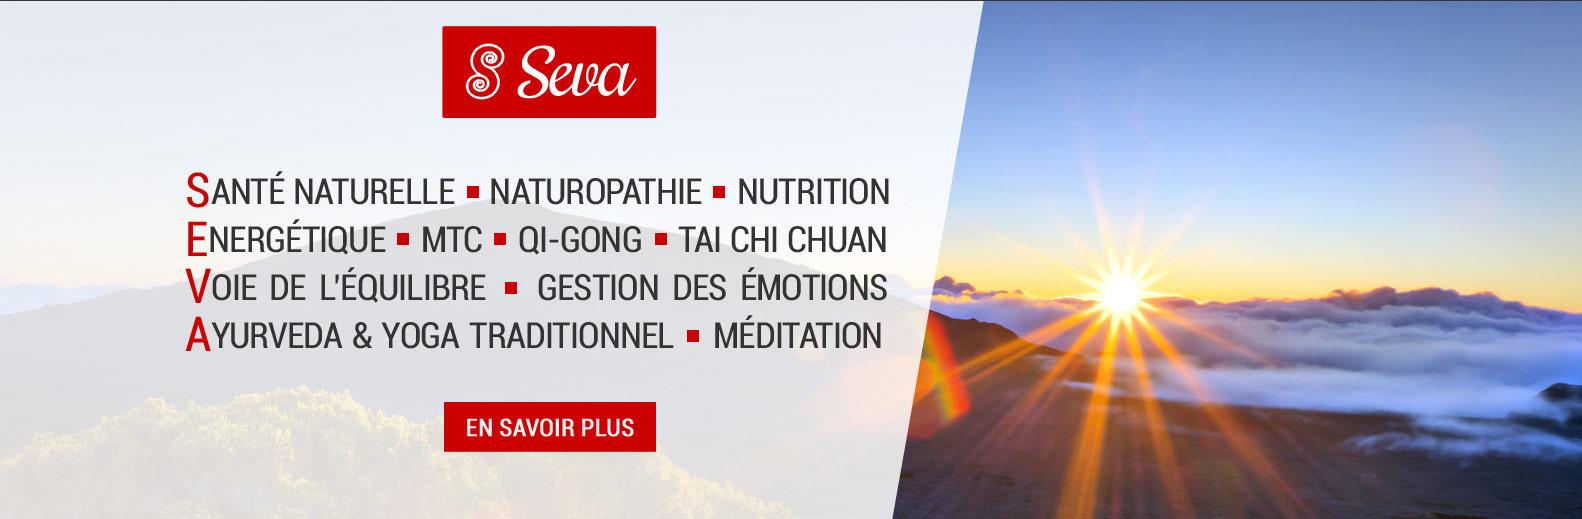 Naturopathie, médecine chinoise, naturopathie, méditation, yoga